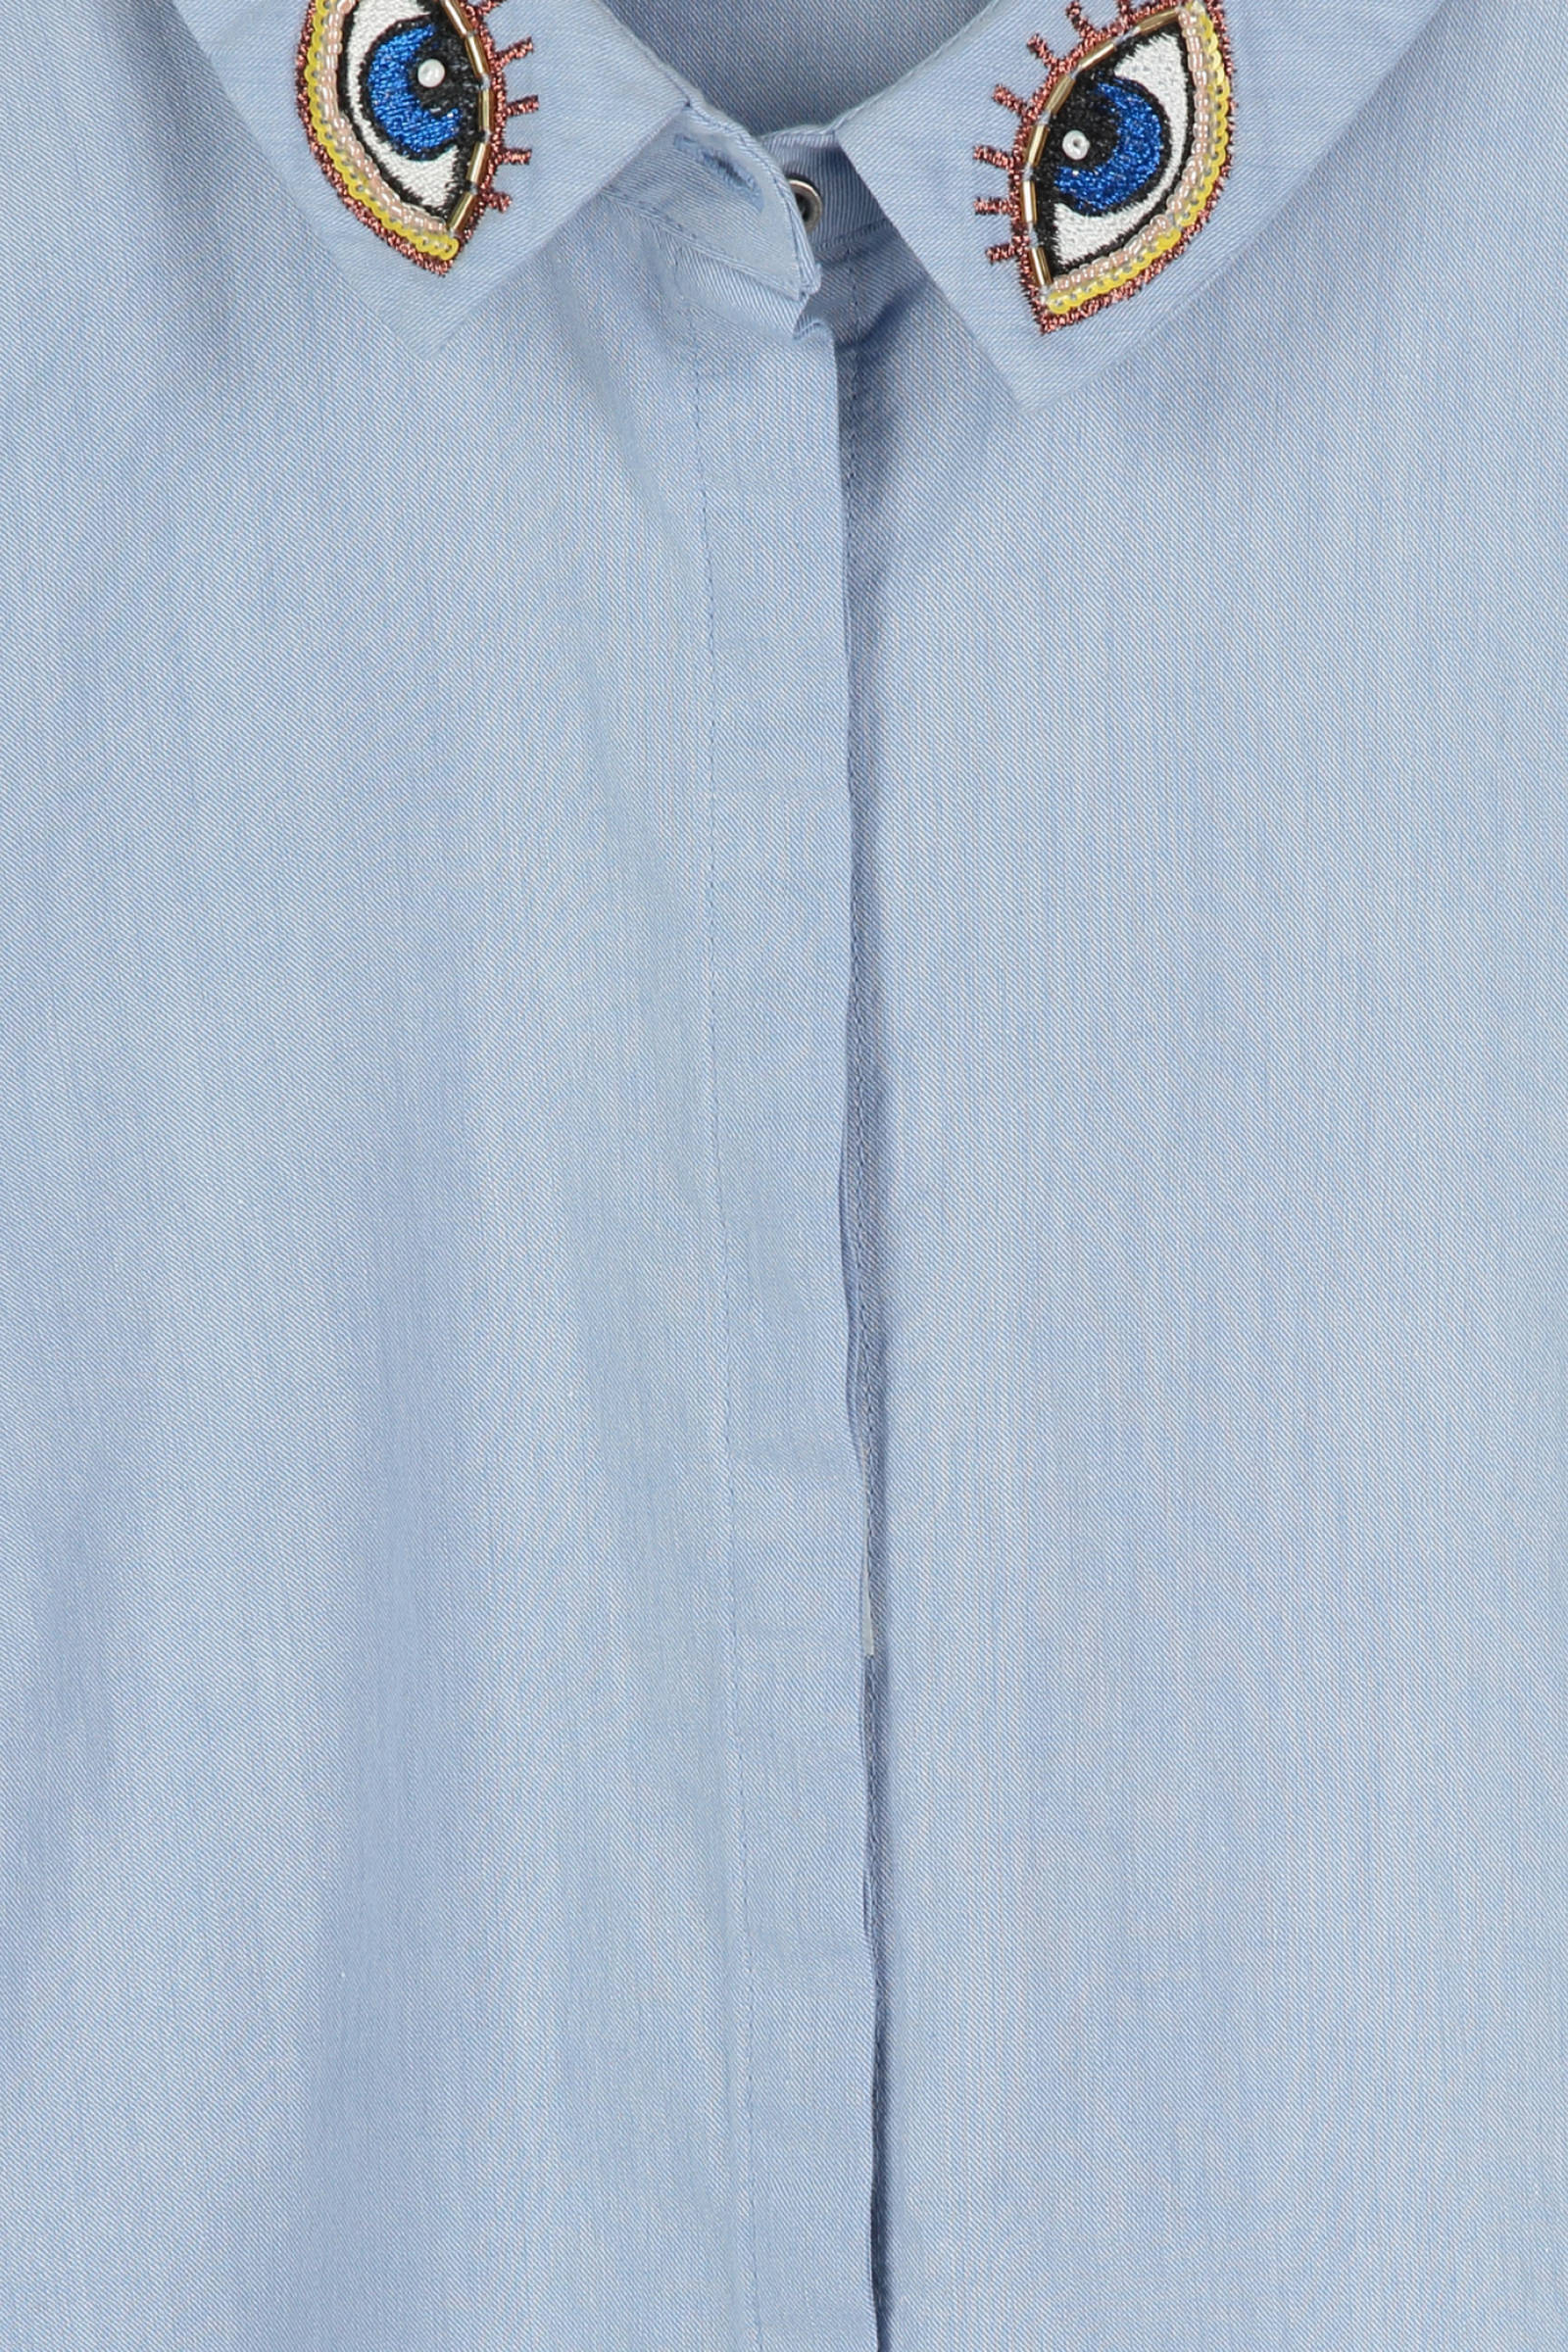 lichtblauw blouse met borduursel CKS Marjanne zqAAU